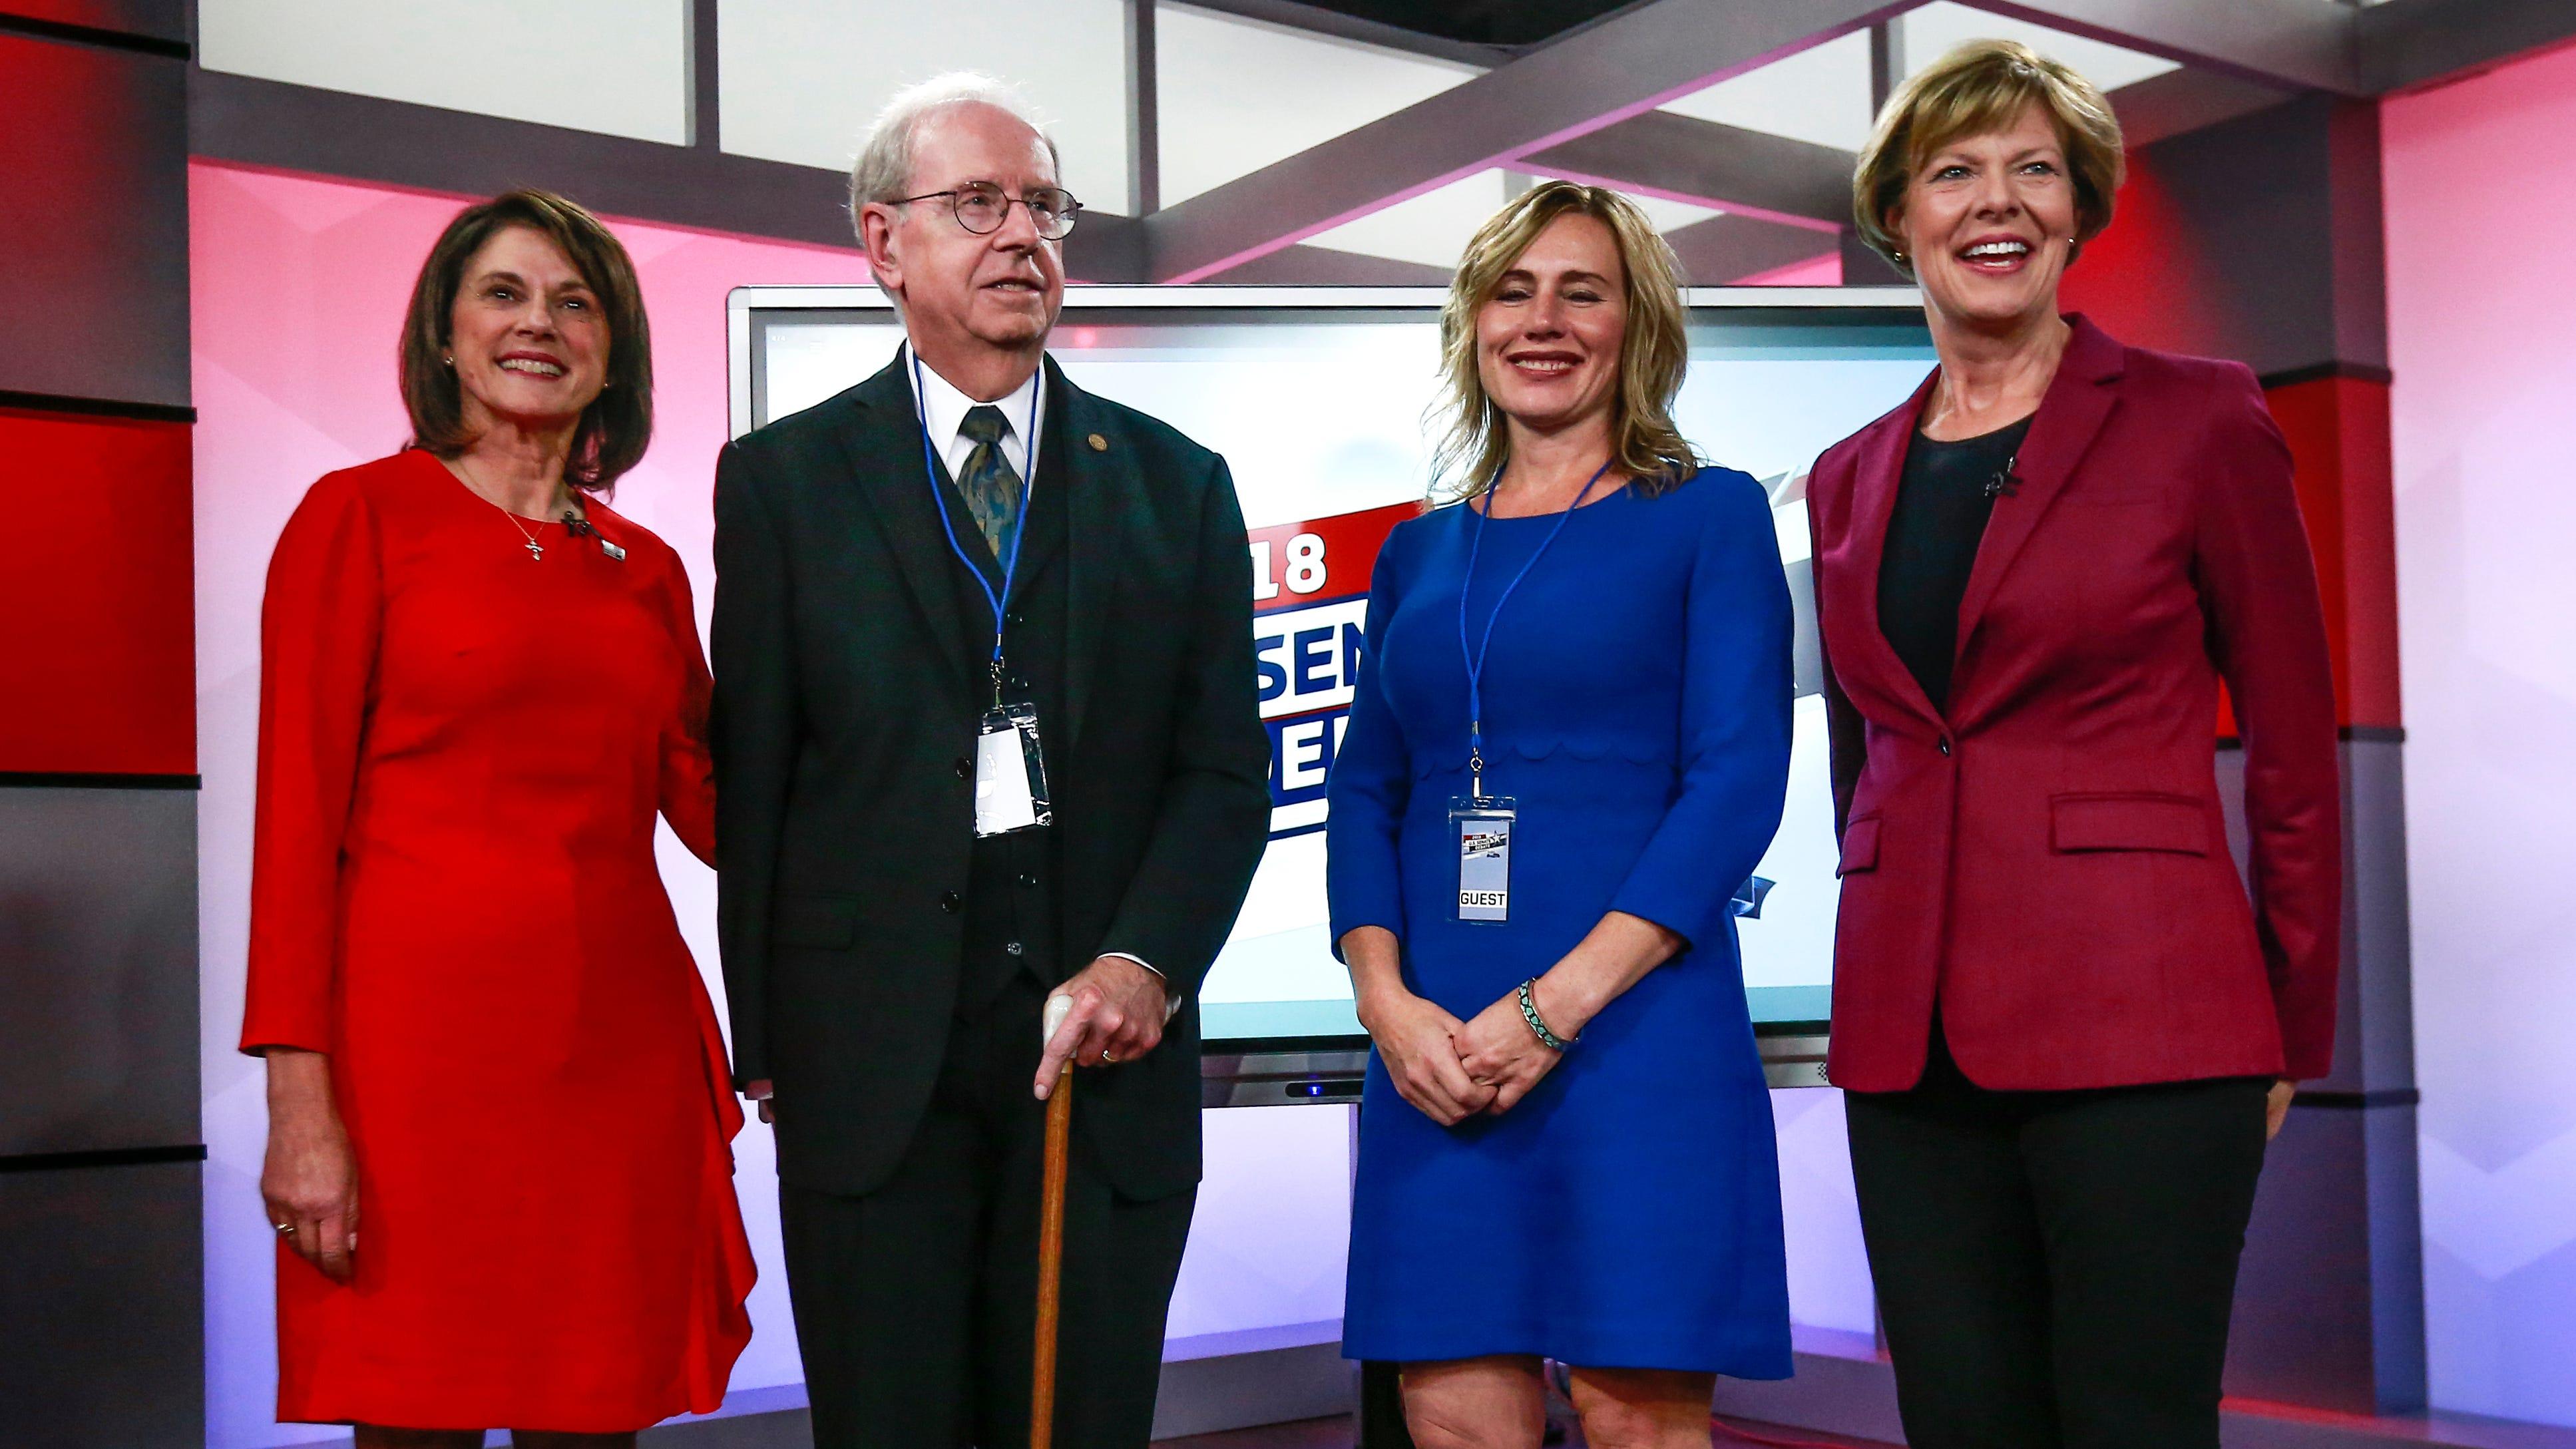 From left, Republican Leah Vukmir, Rolf Wegenke, Rebecca Laron and Democratic U.S. Sen. Tammy Baldwin  pose before Vukmir and Baldwin debated in Wausau  Saturday night, Oct. 13, 2018.